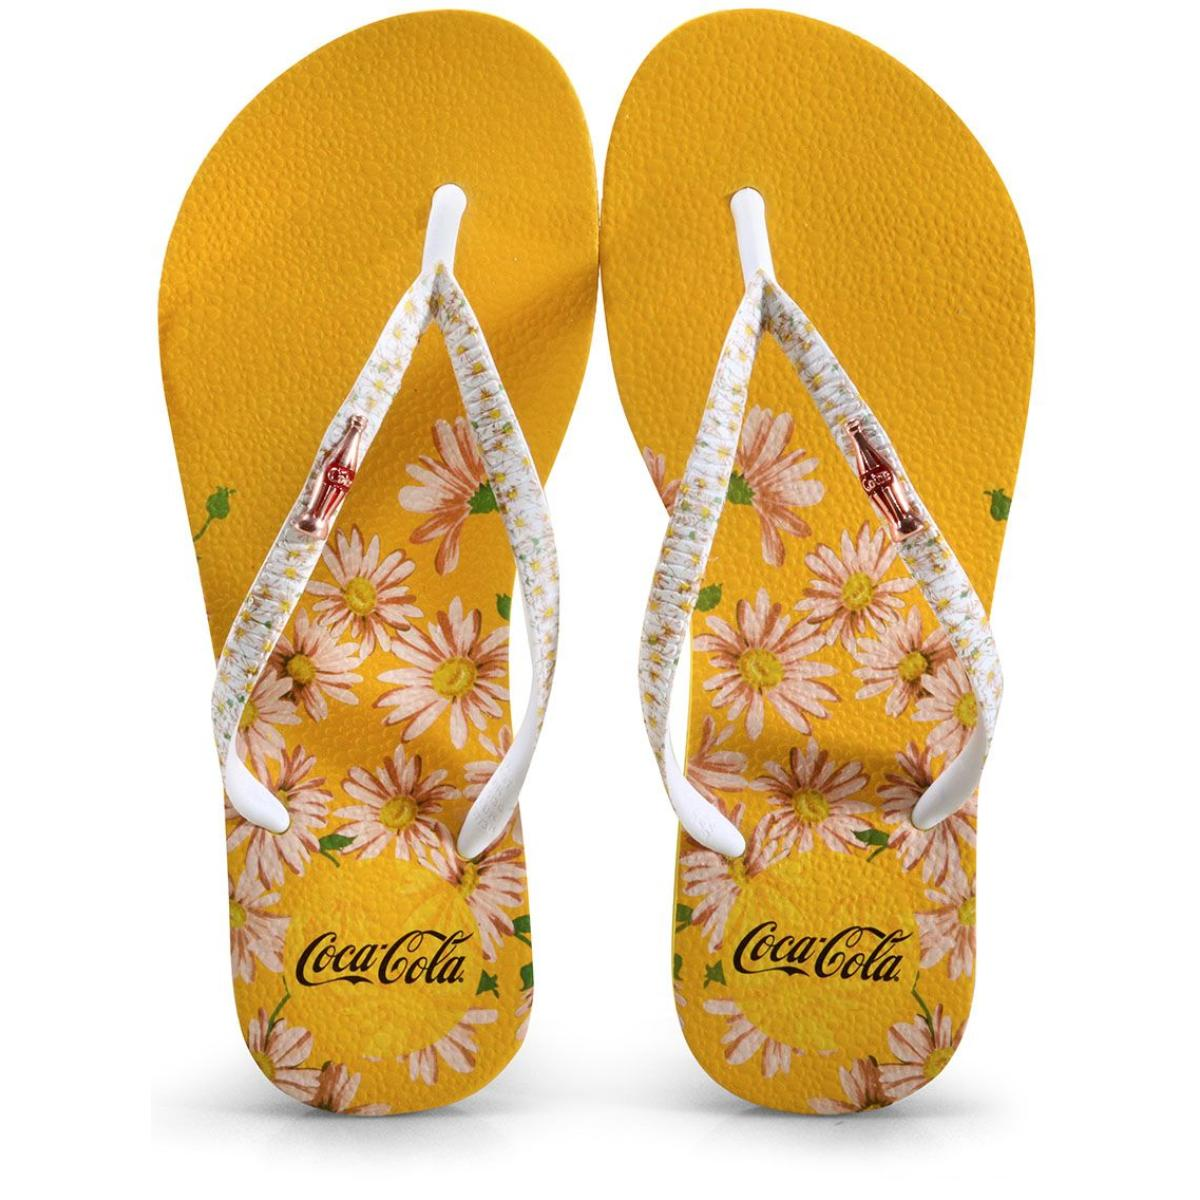 Chinelo Feminino Coca-cola Shoes Cc3110 Amarelo/branco